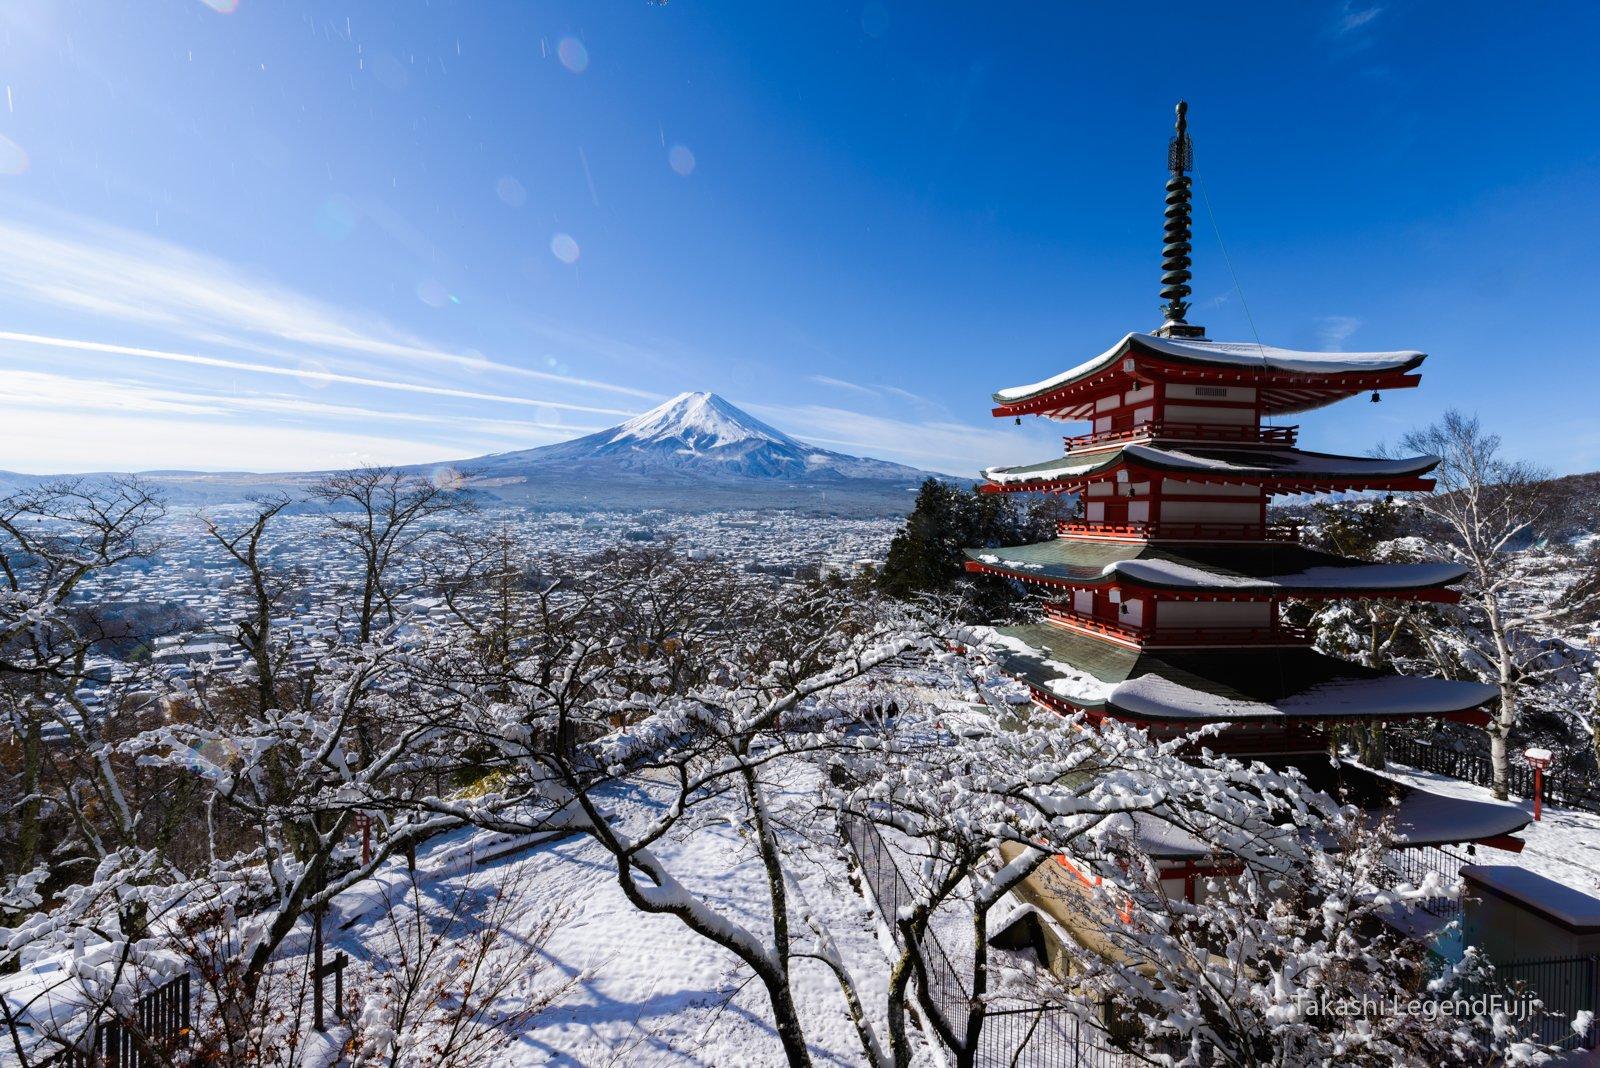 Fuji,Japan,mountain,snow,pagoda,tree,sky,blue,white,, Takashi